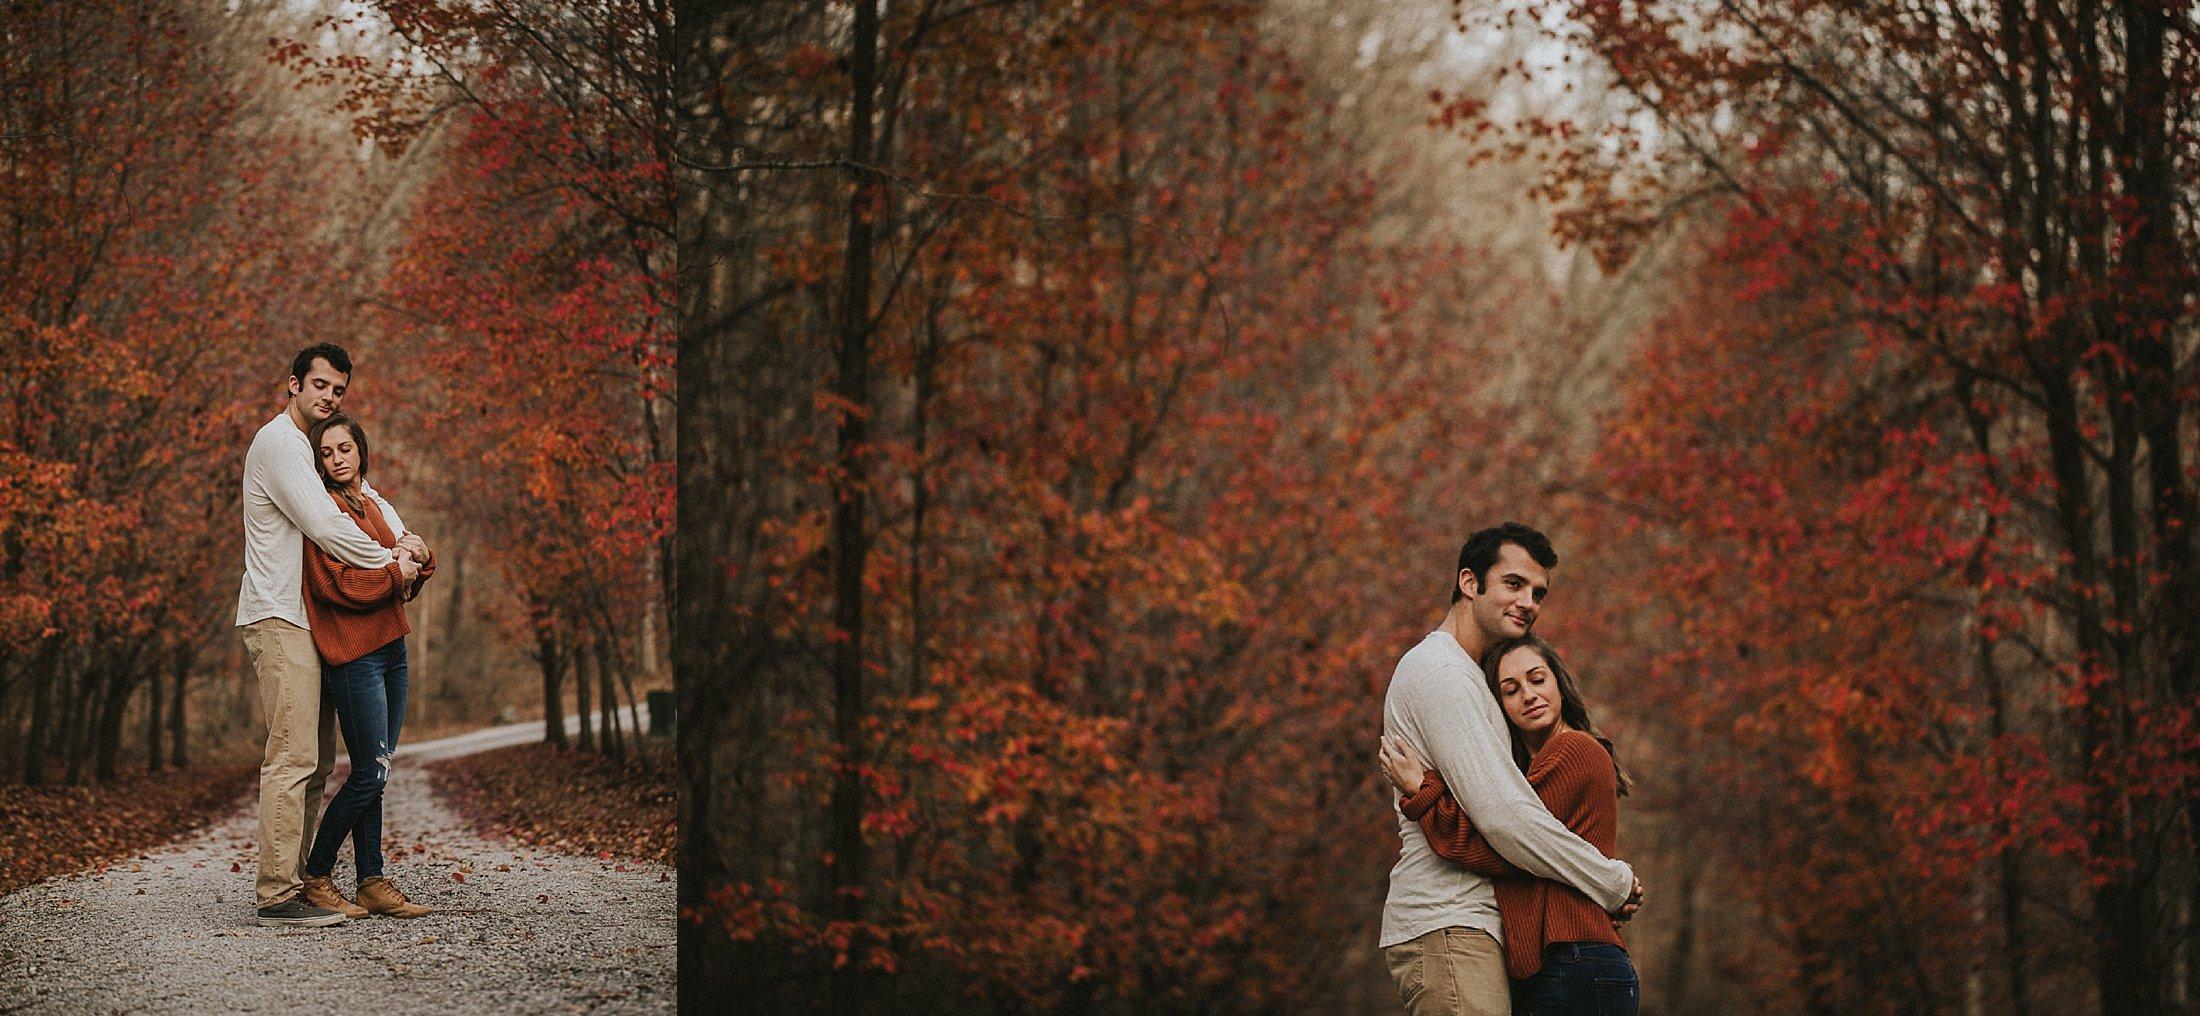 Alternative-wedding-photographers-nashville-tn--10.jpg